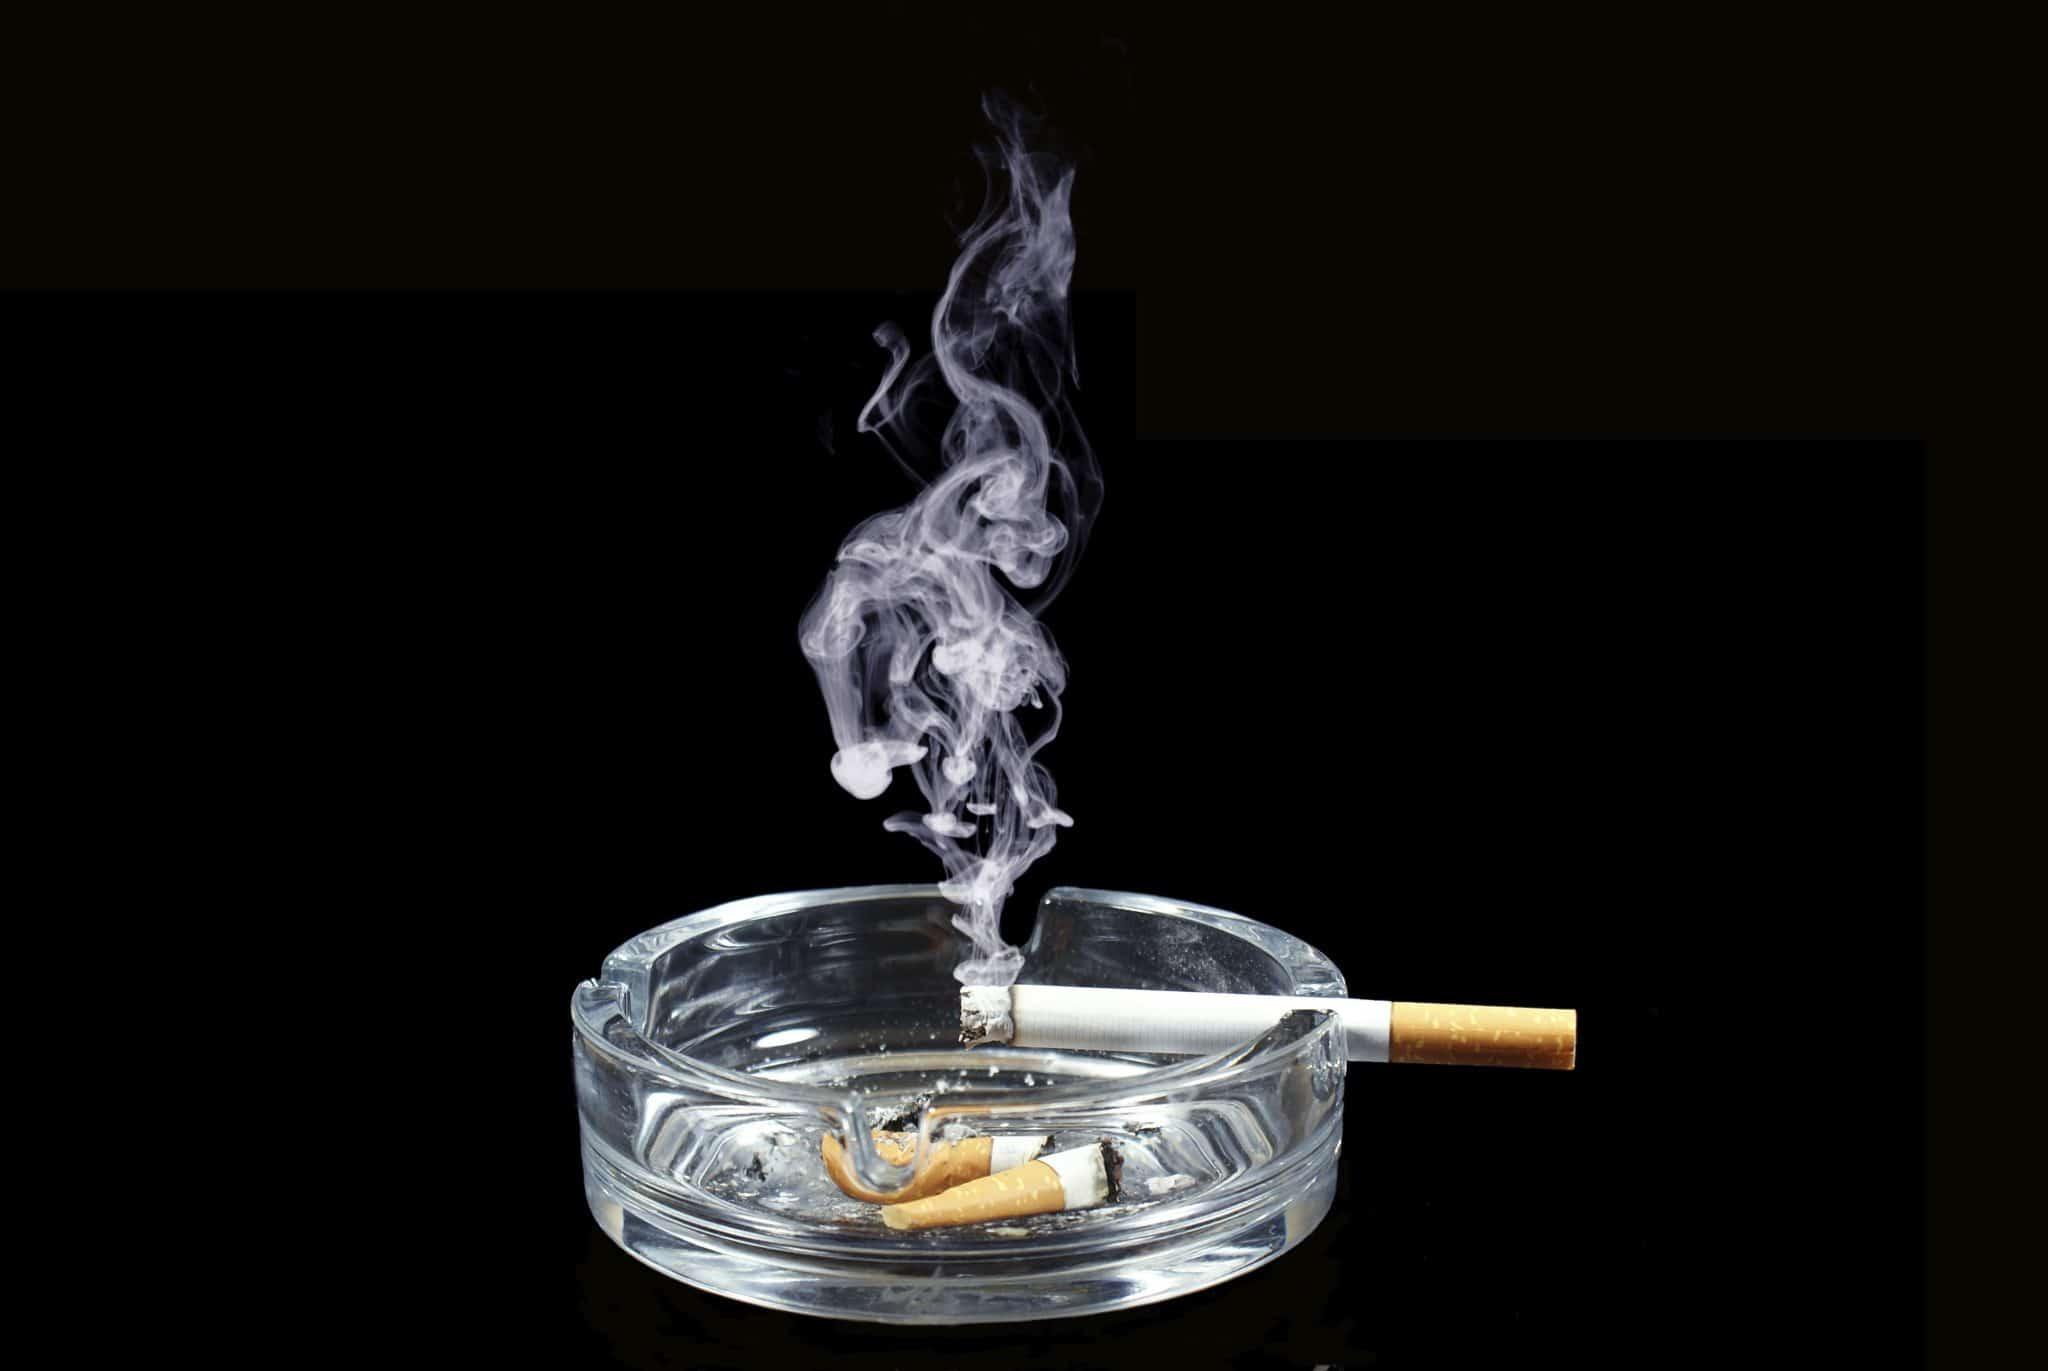 Cigarette - NAET Dubai